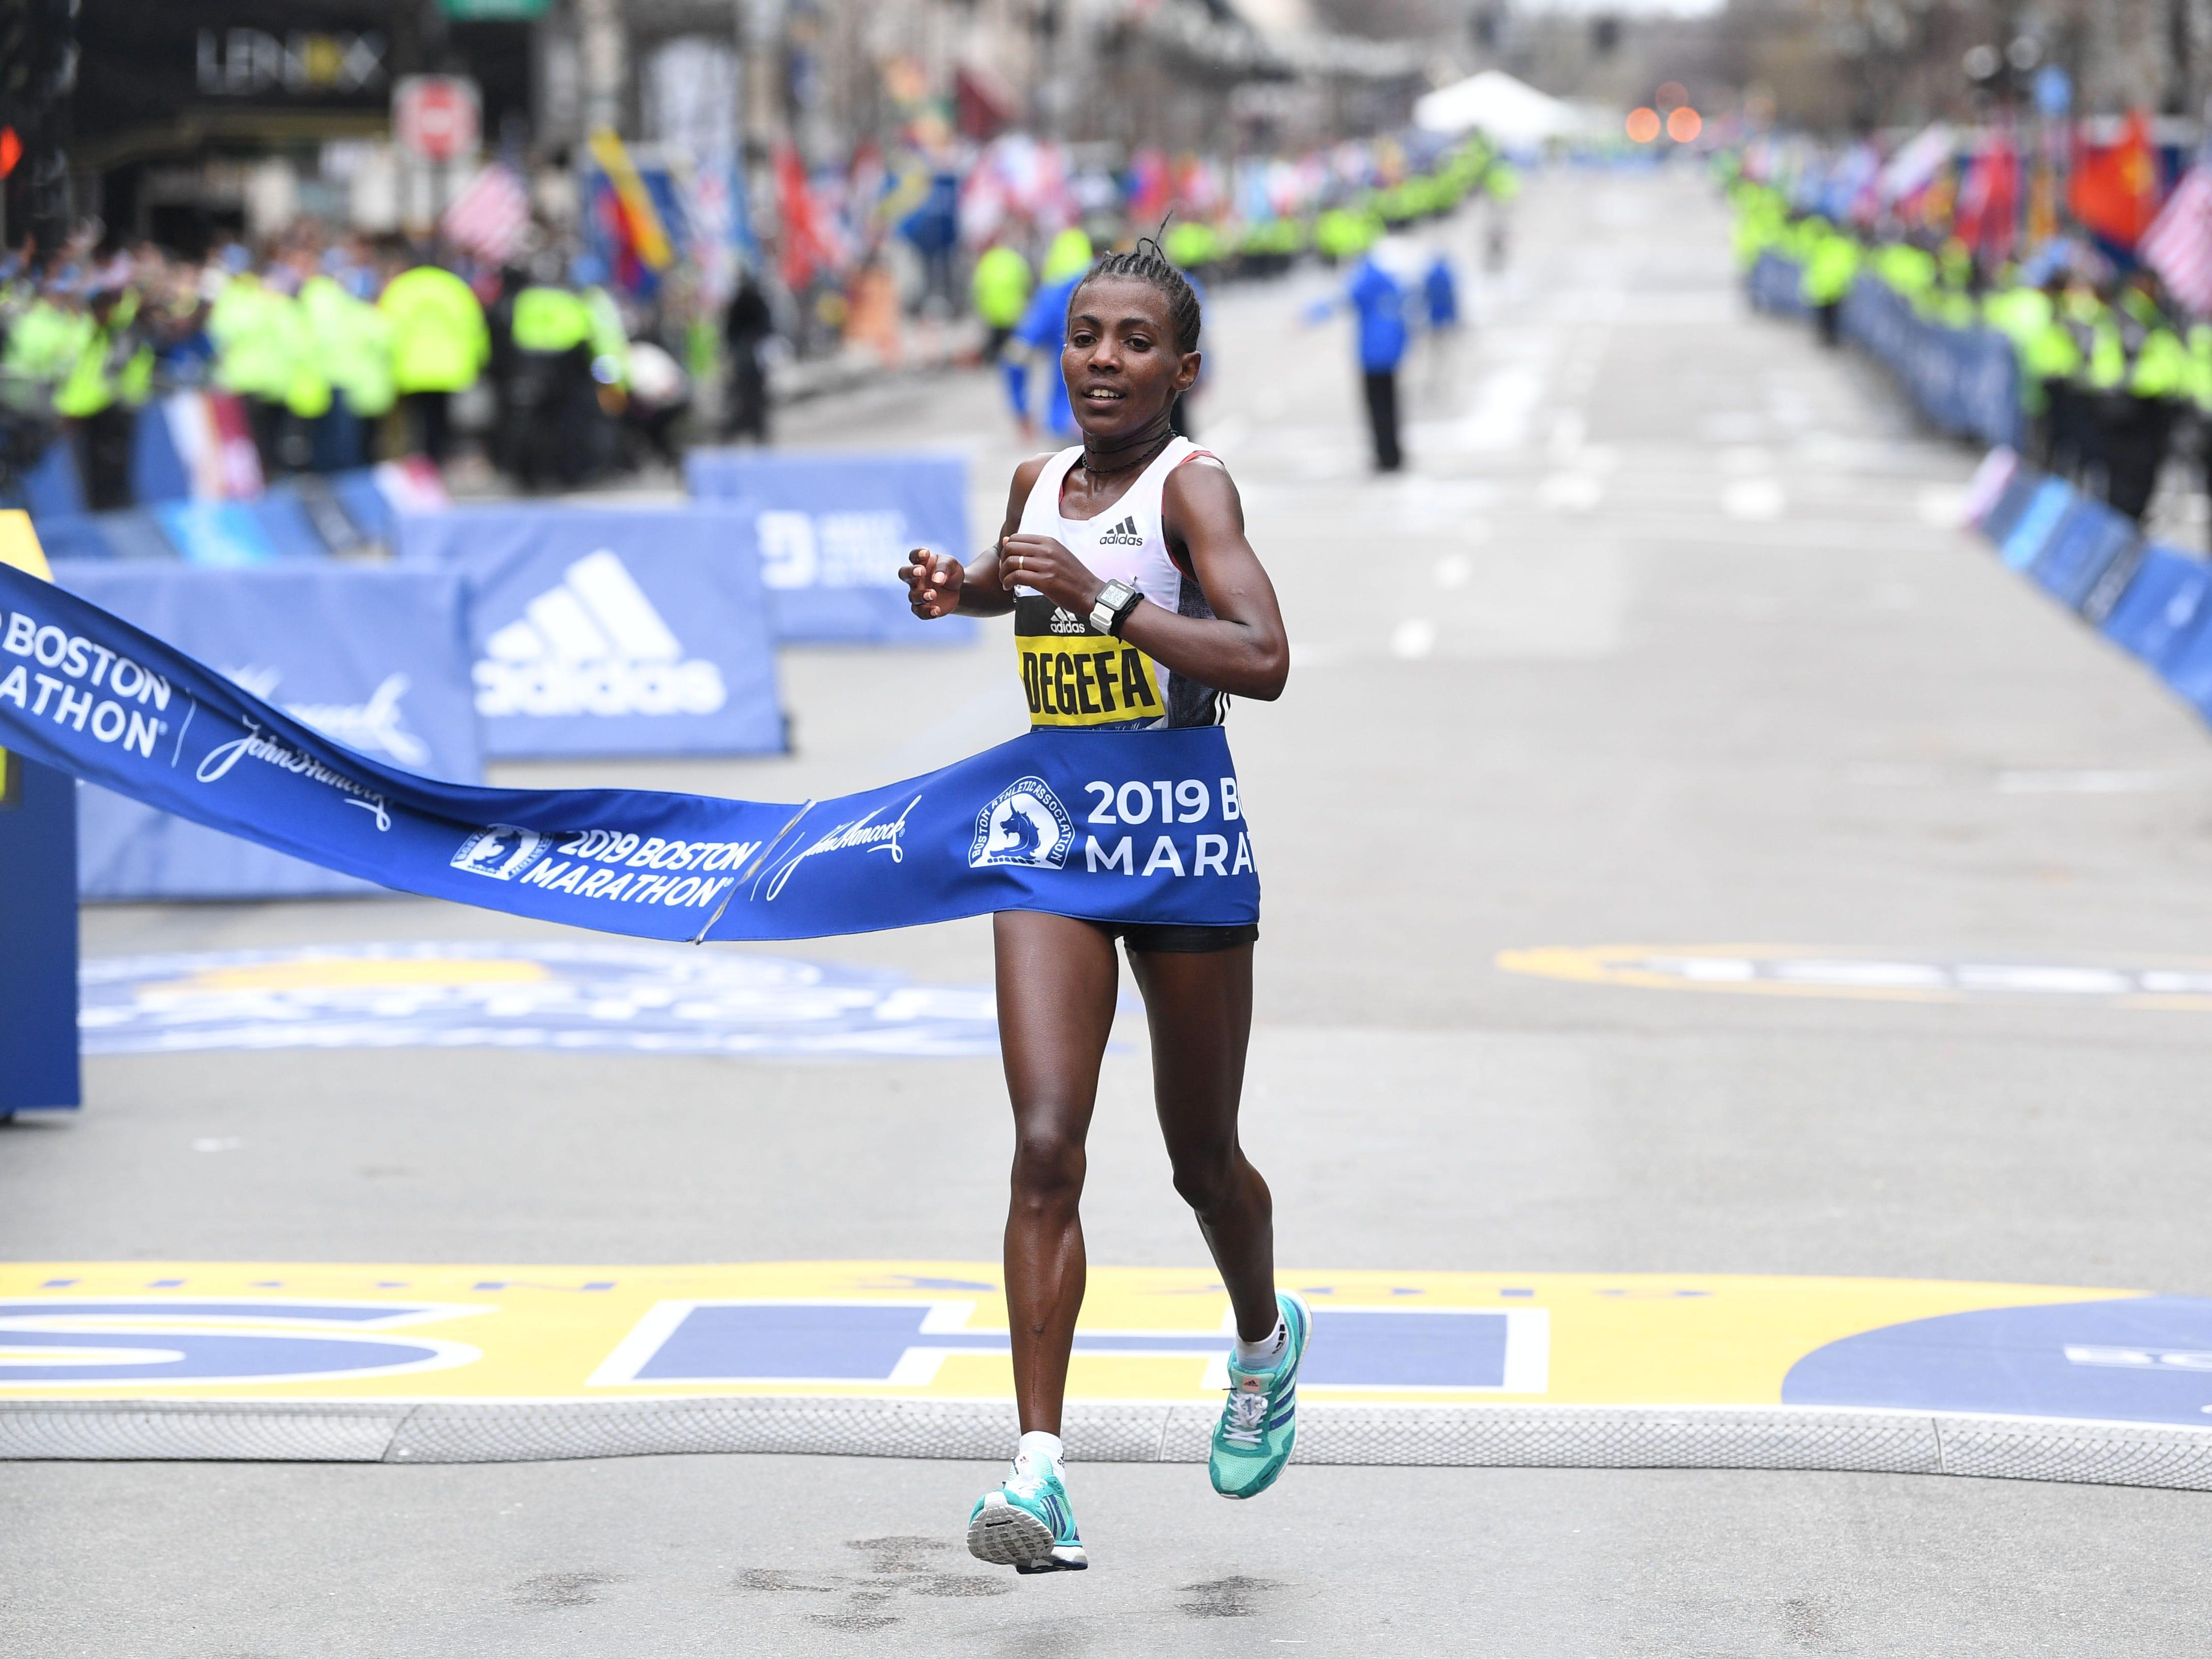 Worknesh Degefa (ETH) crosses the finish line to win the 2019 Boston Marathon.